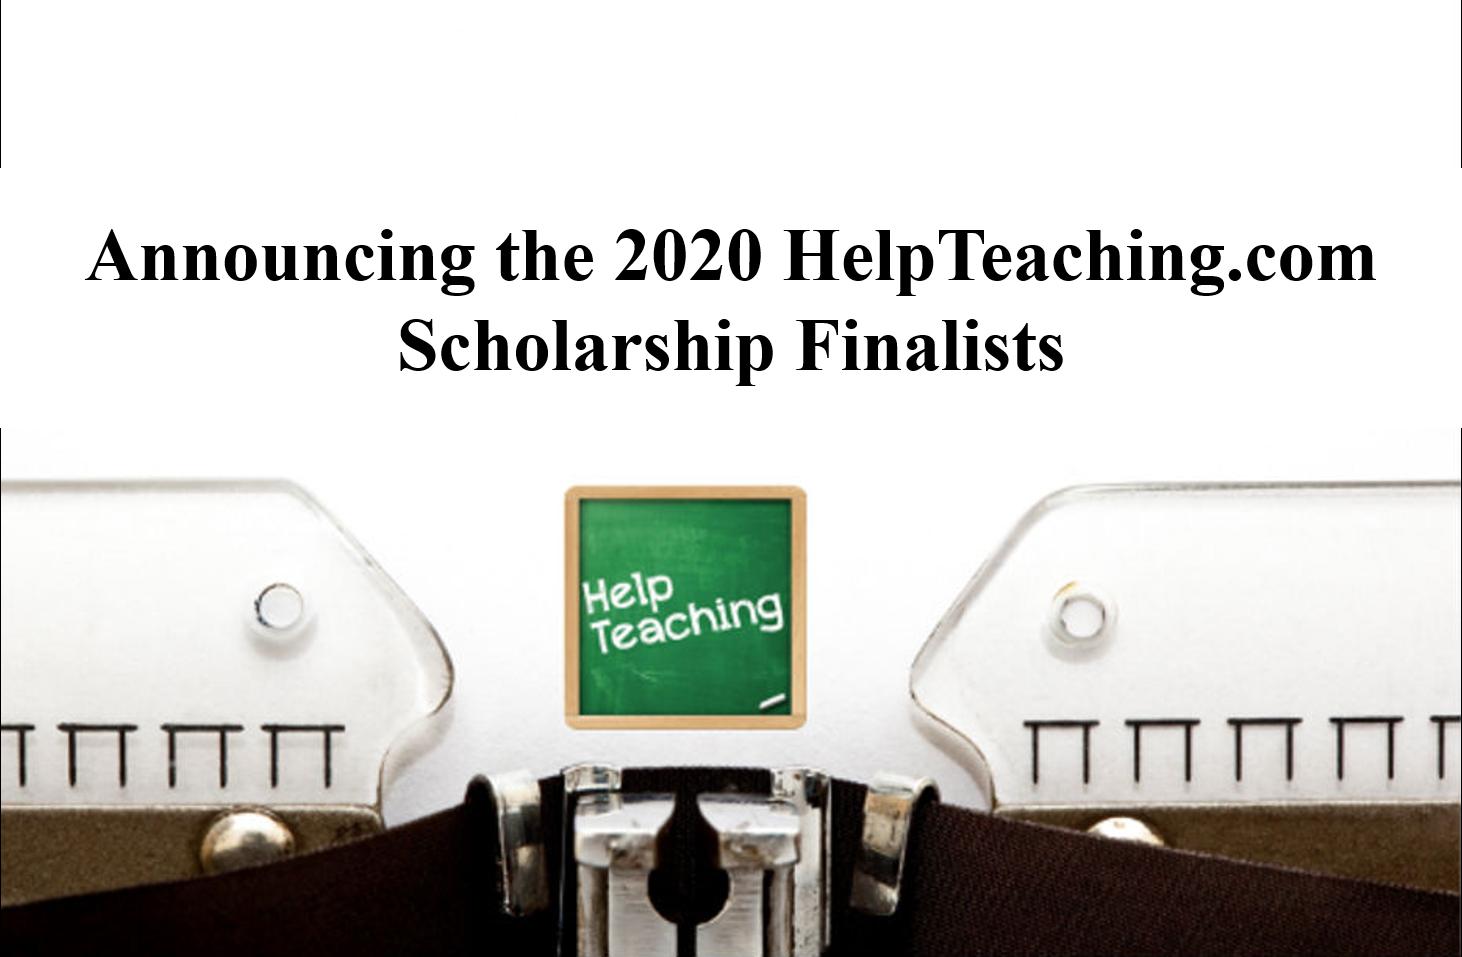 2020 Help Teaching Scholarship Finalists